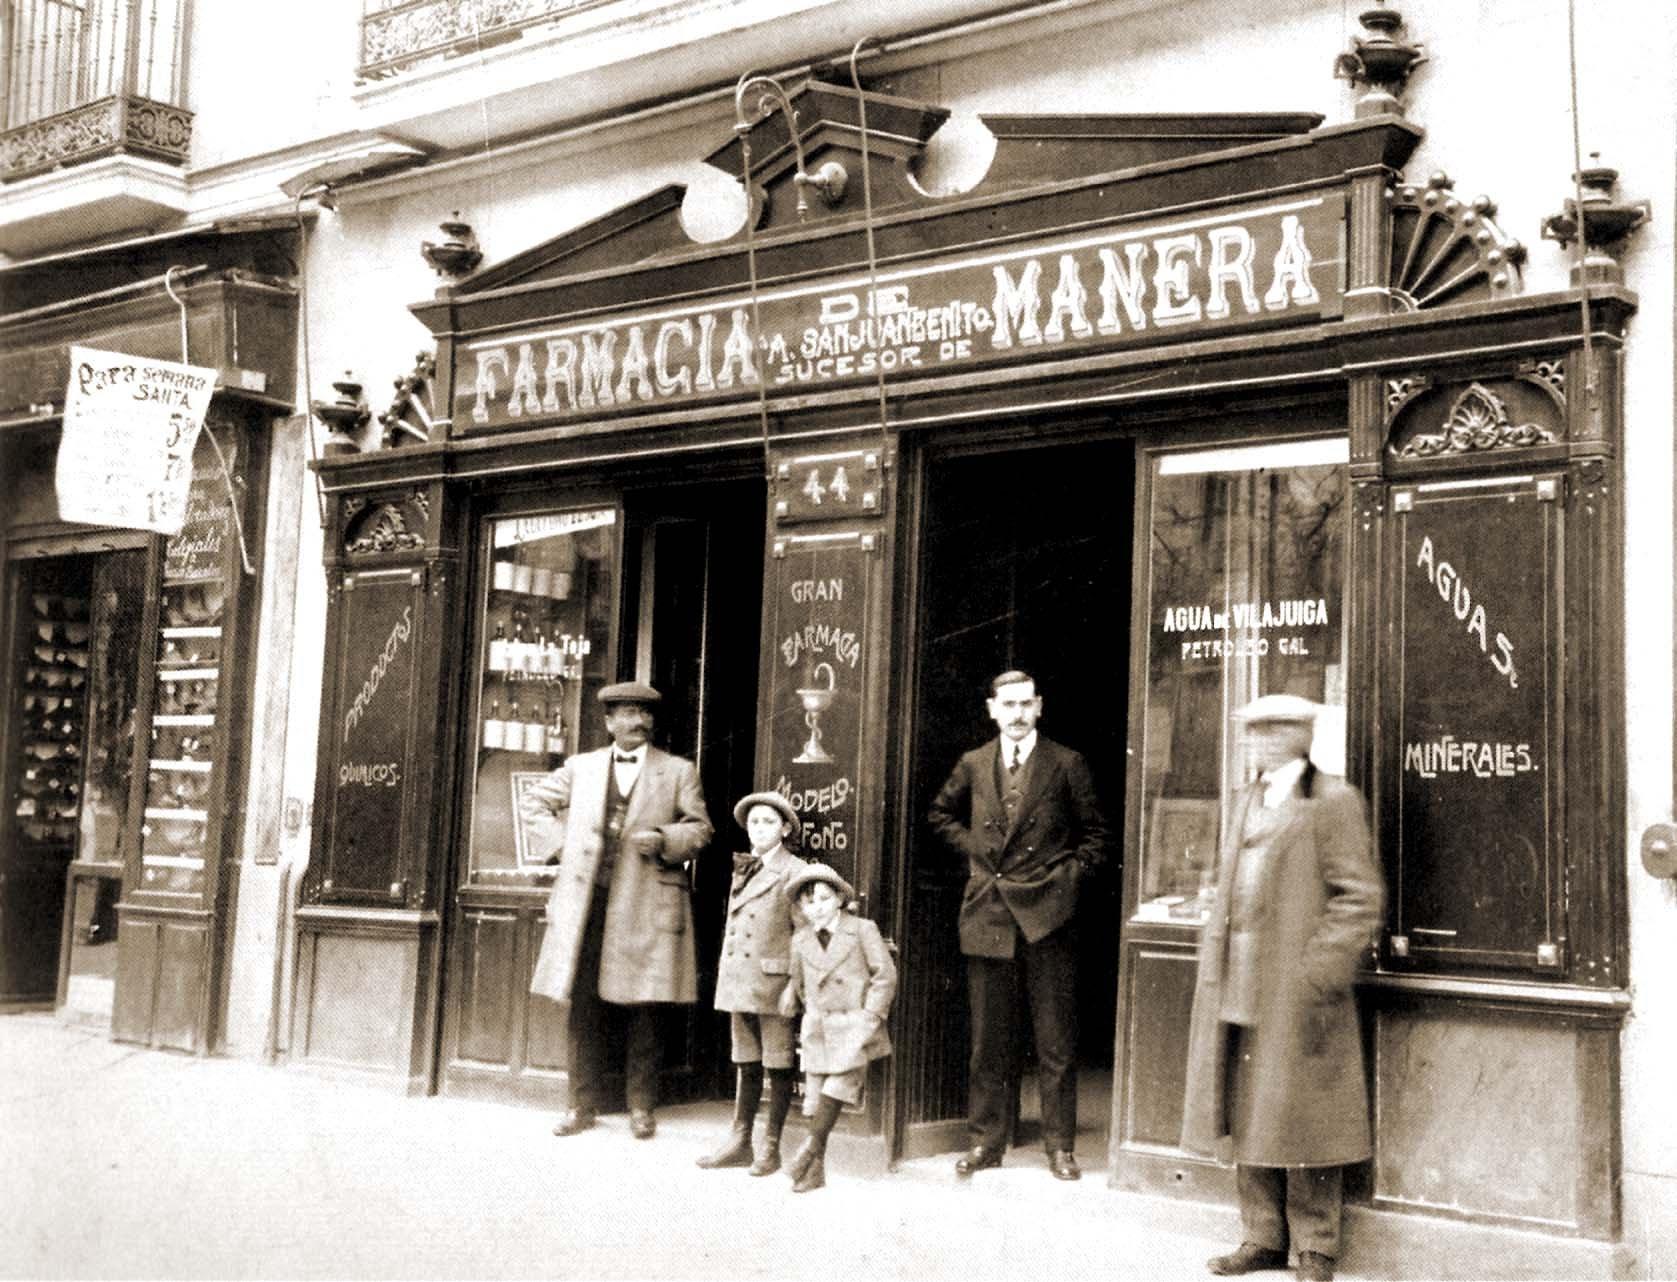 Farmacia de la Calle Serrano, 1905. Madrid